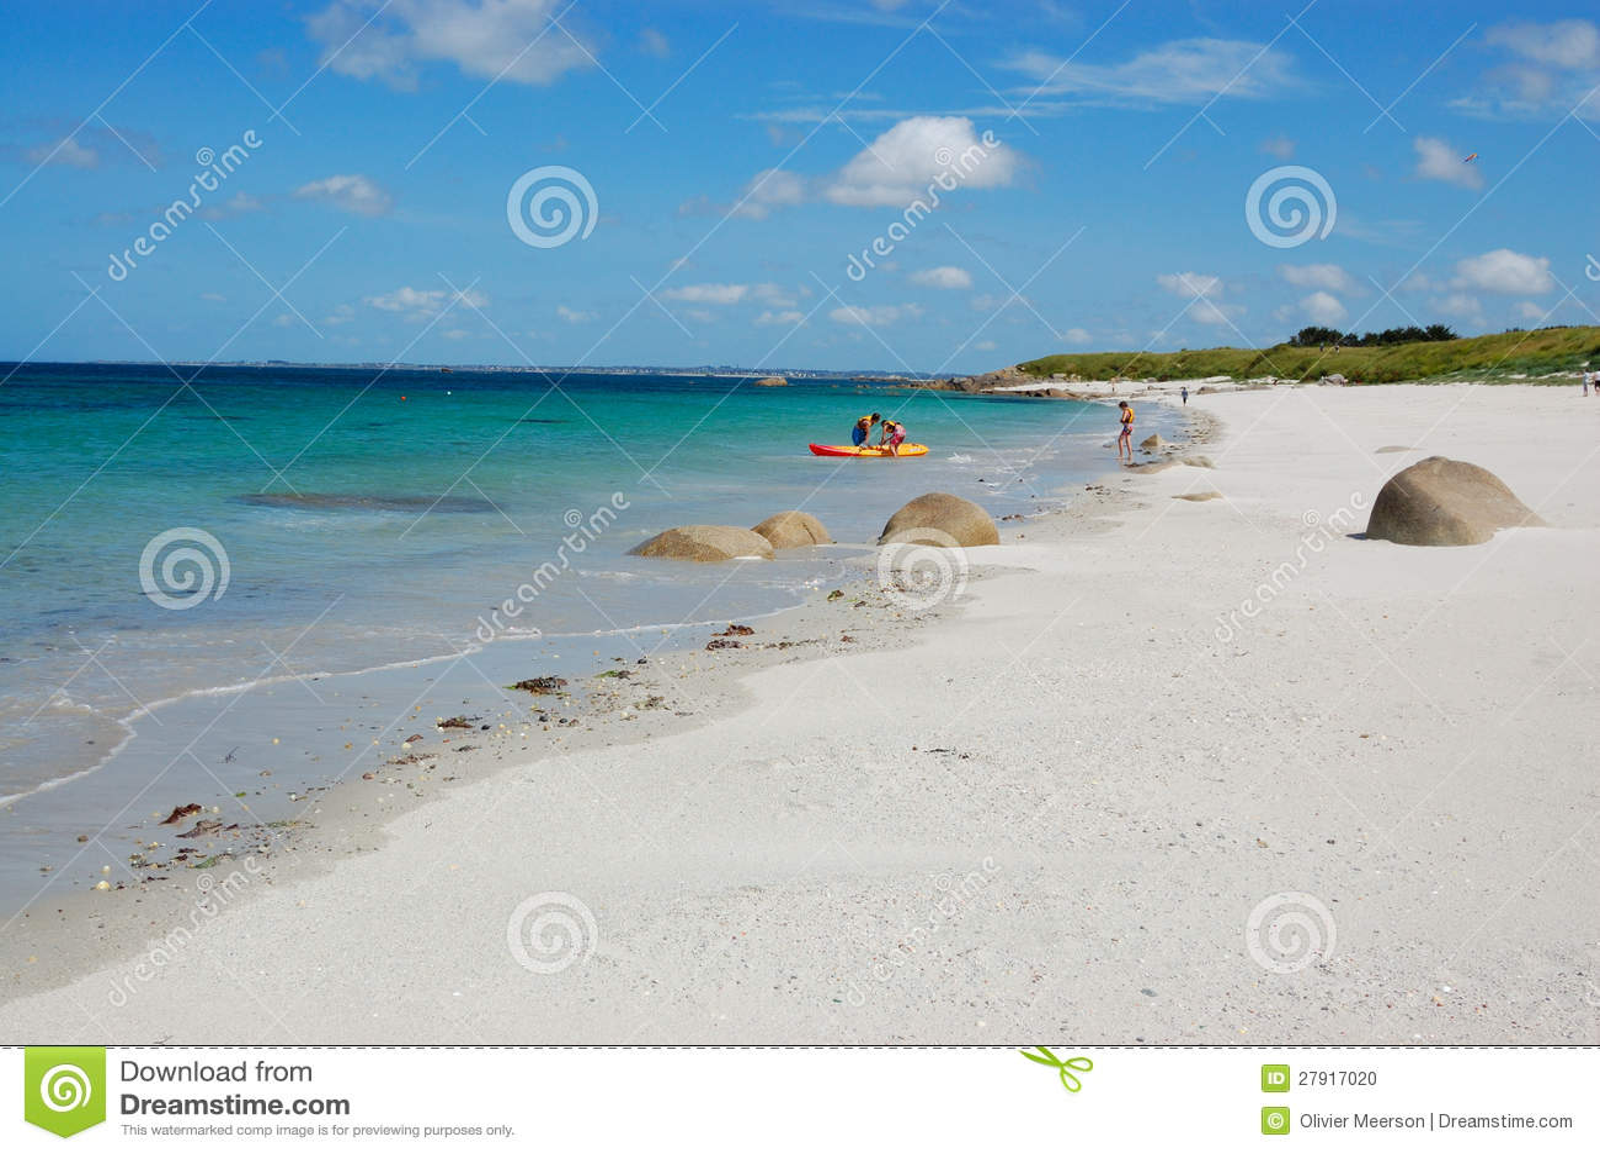 A beginner's guide to Brittany France - Travel Dejavu  |Beach Bretagne France